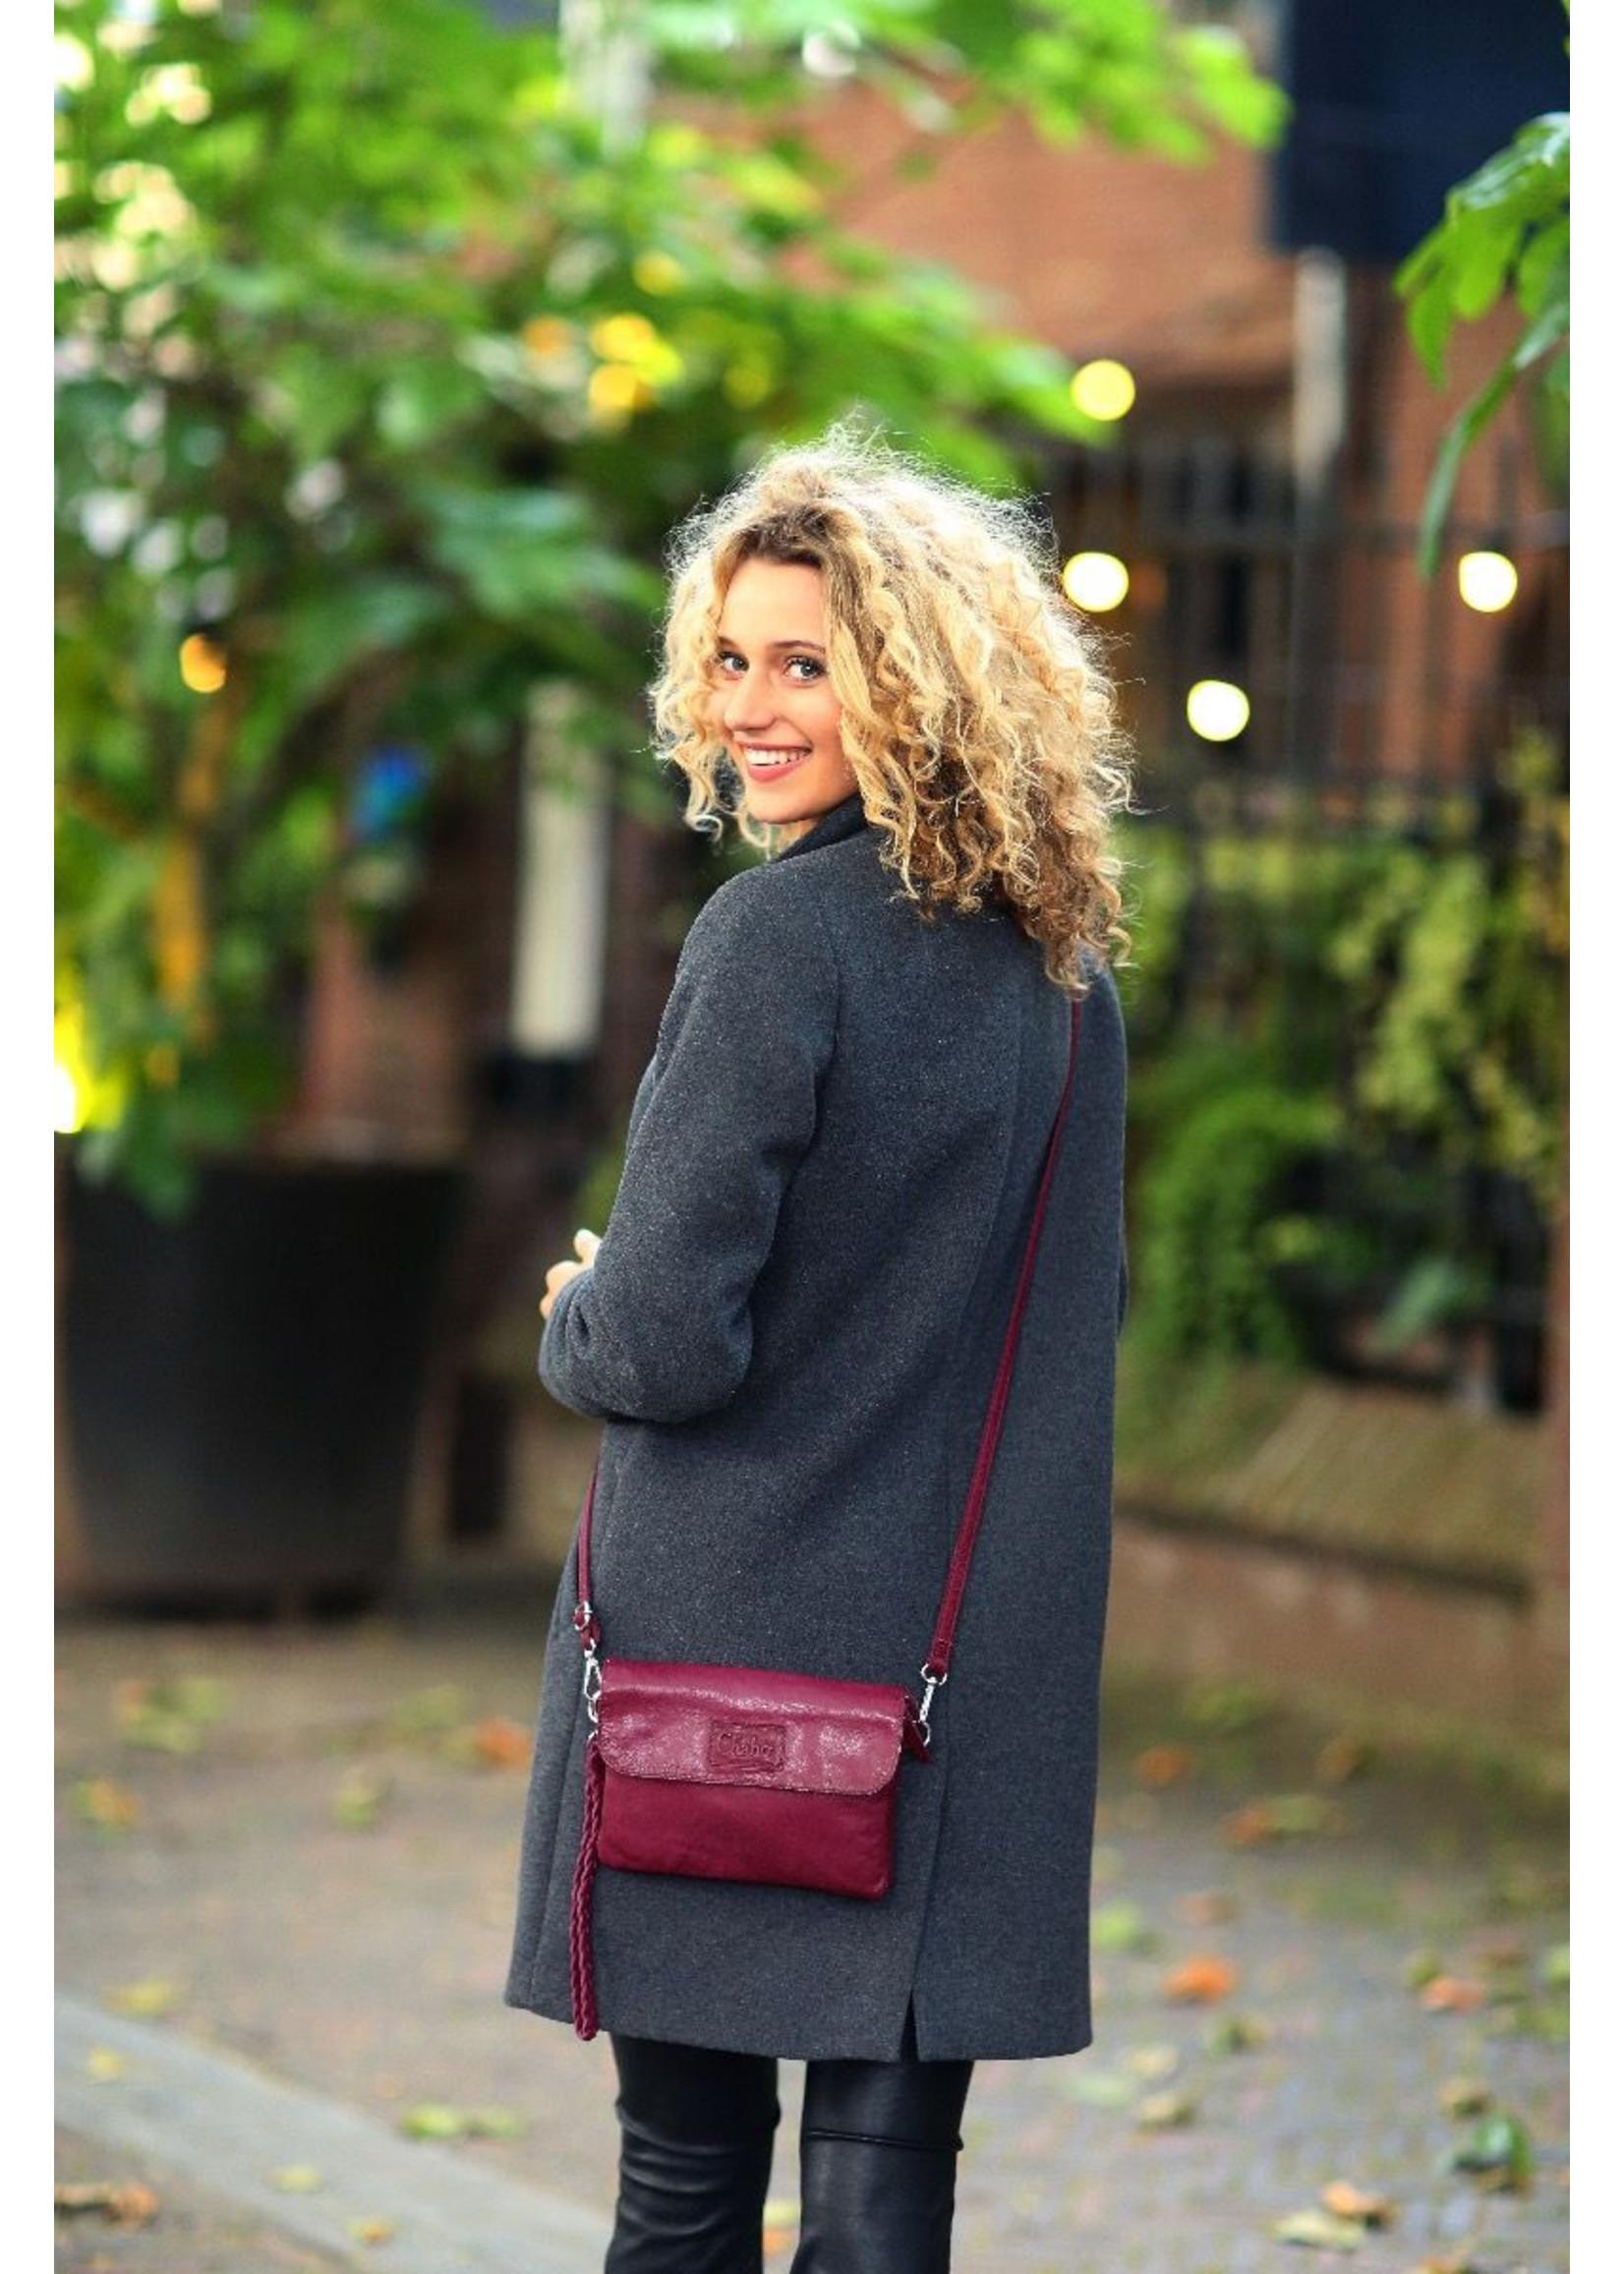 Chabo Bags Bink Style Crossover tas Aubergine